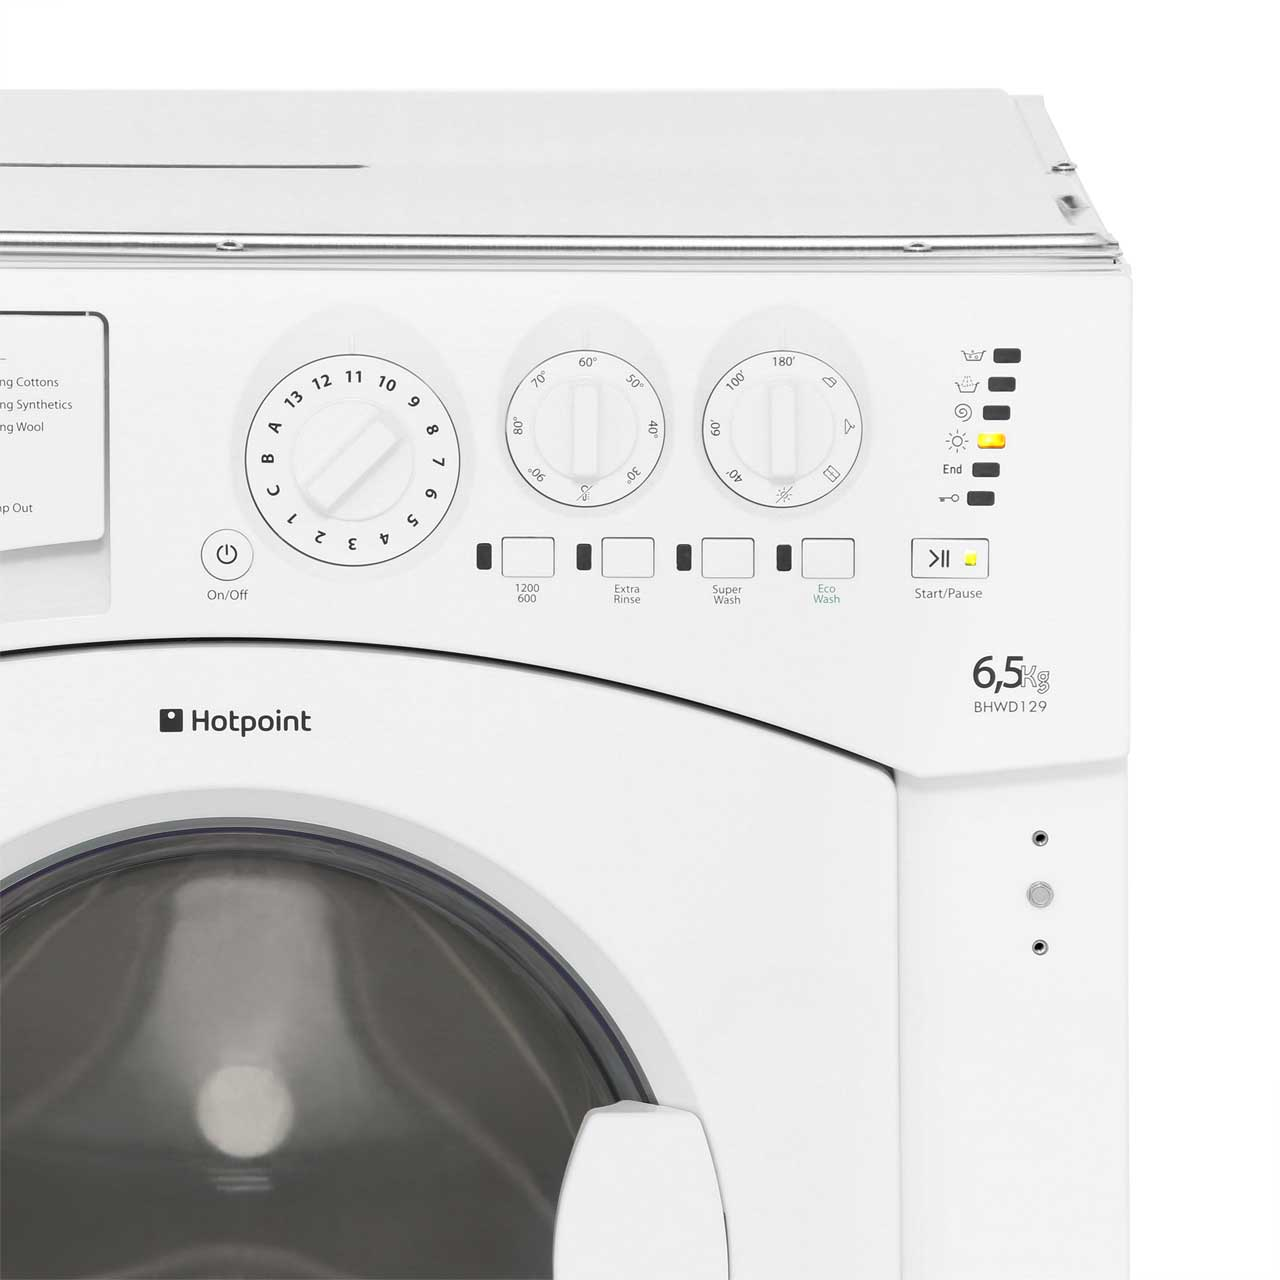 hotpoint built in washer dryer bhwd129 2. Black Bedroom Furniture Sets. Home Design Ideas